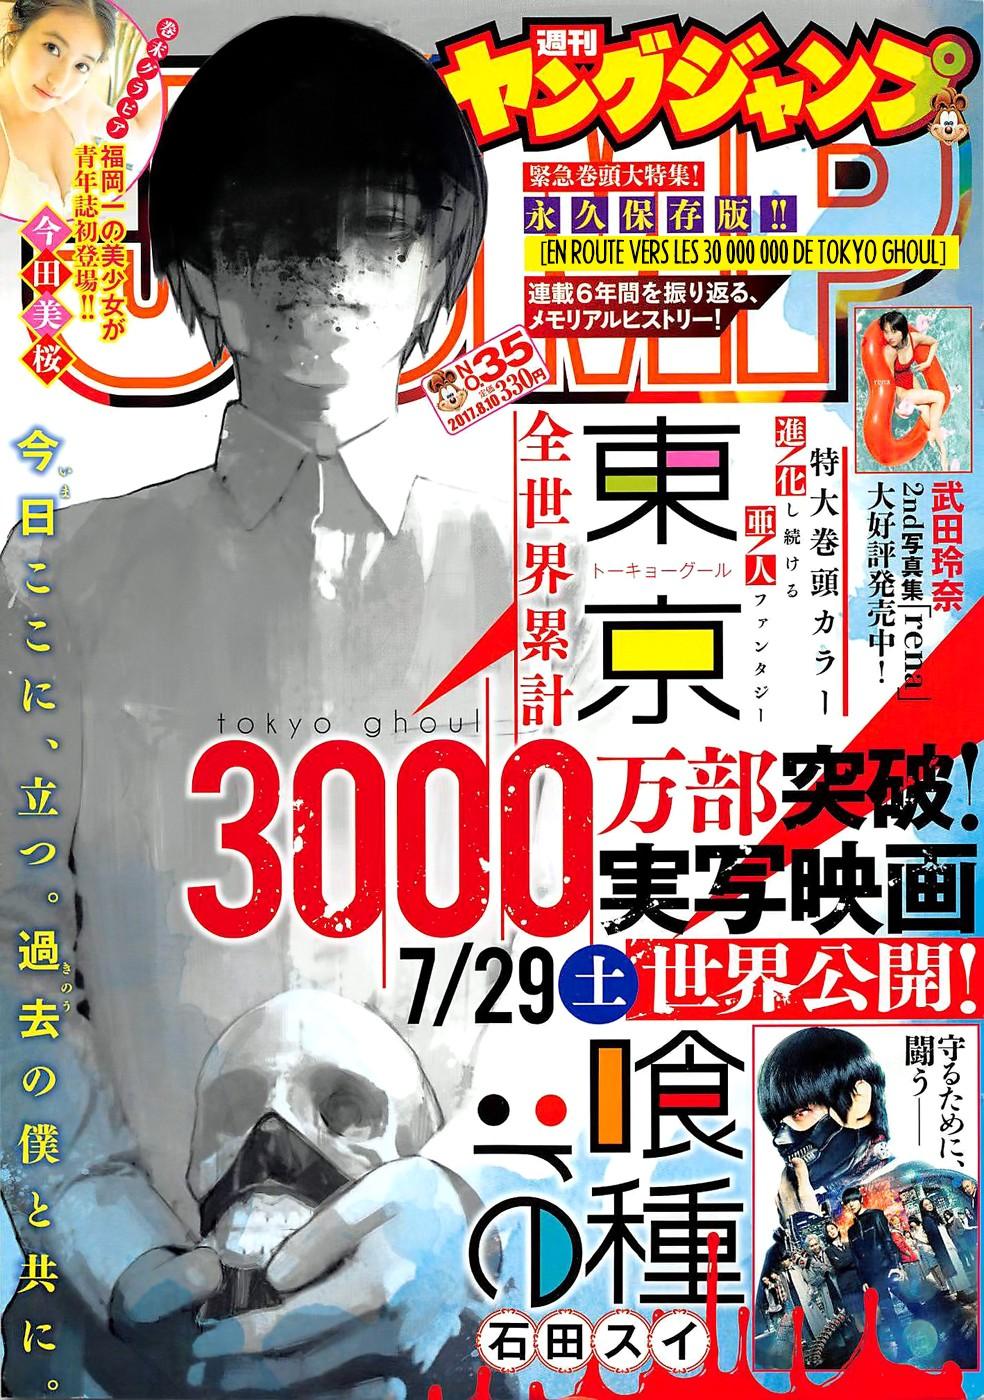 Lecture en ligne Tokyo Ghoul Re 134 page 1